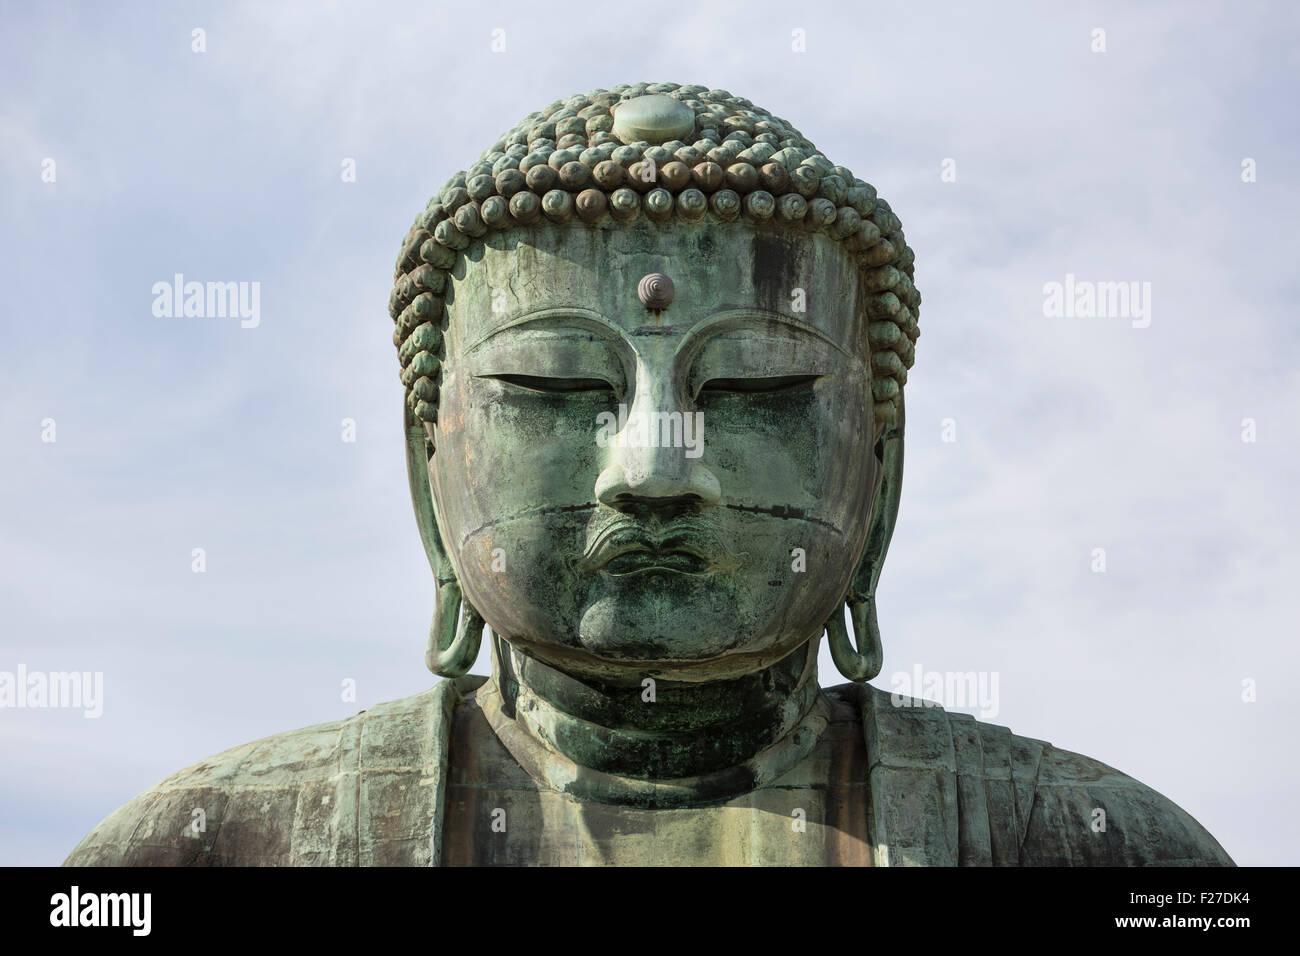 Detail of facial expression of Kamakura Daibutsu, Kanagawa Prefecture Japan. The Great Buddha of Kamakura is a monumental - Stock Image